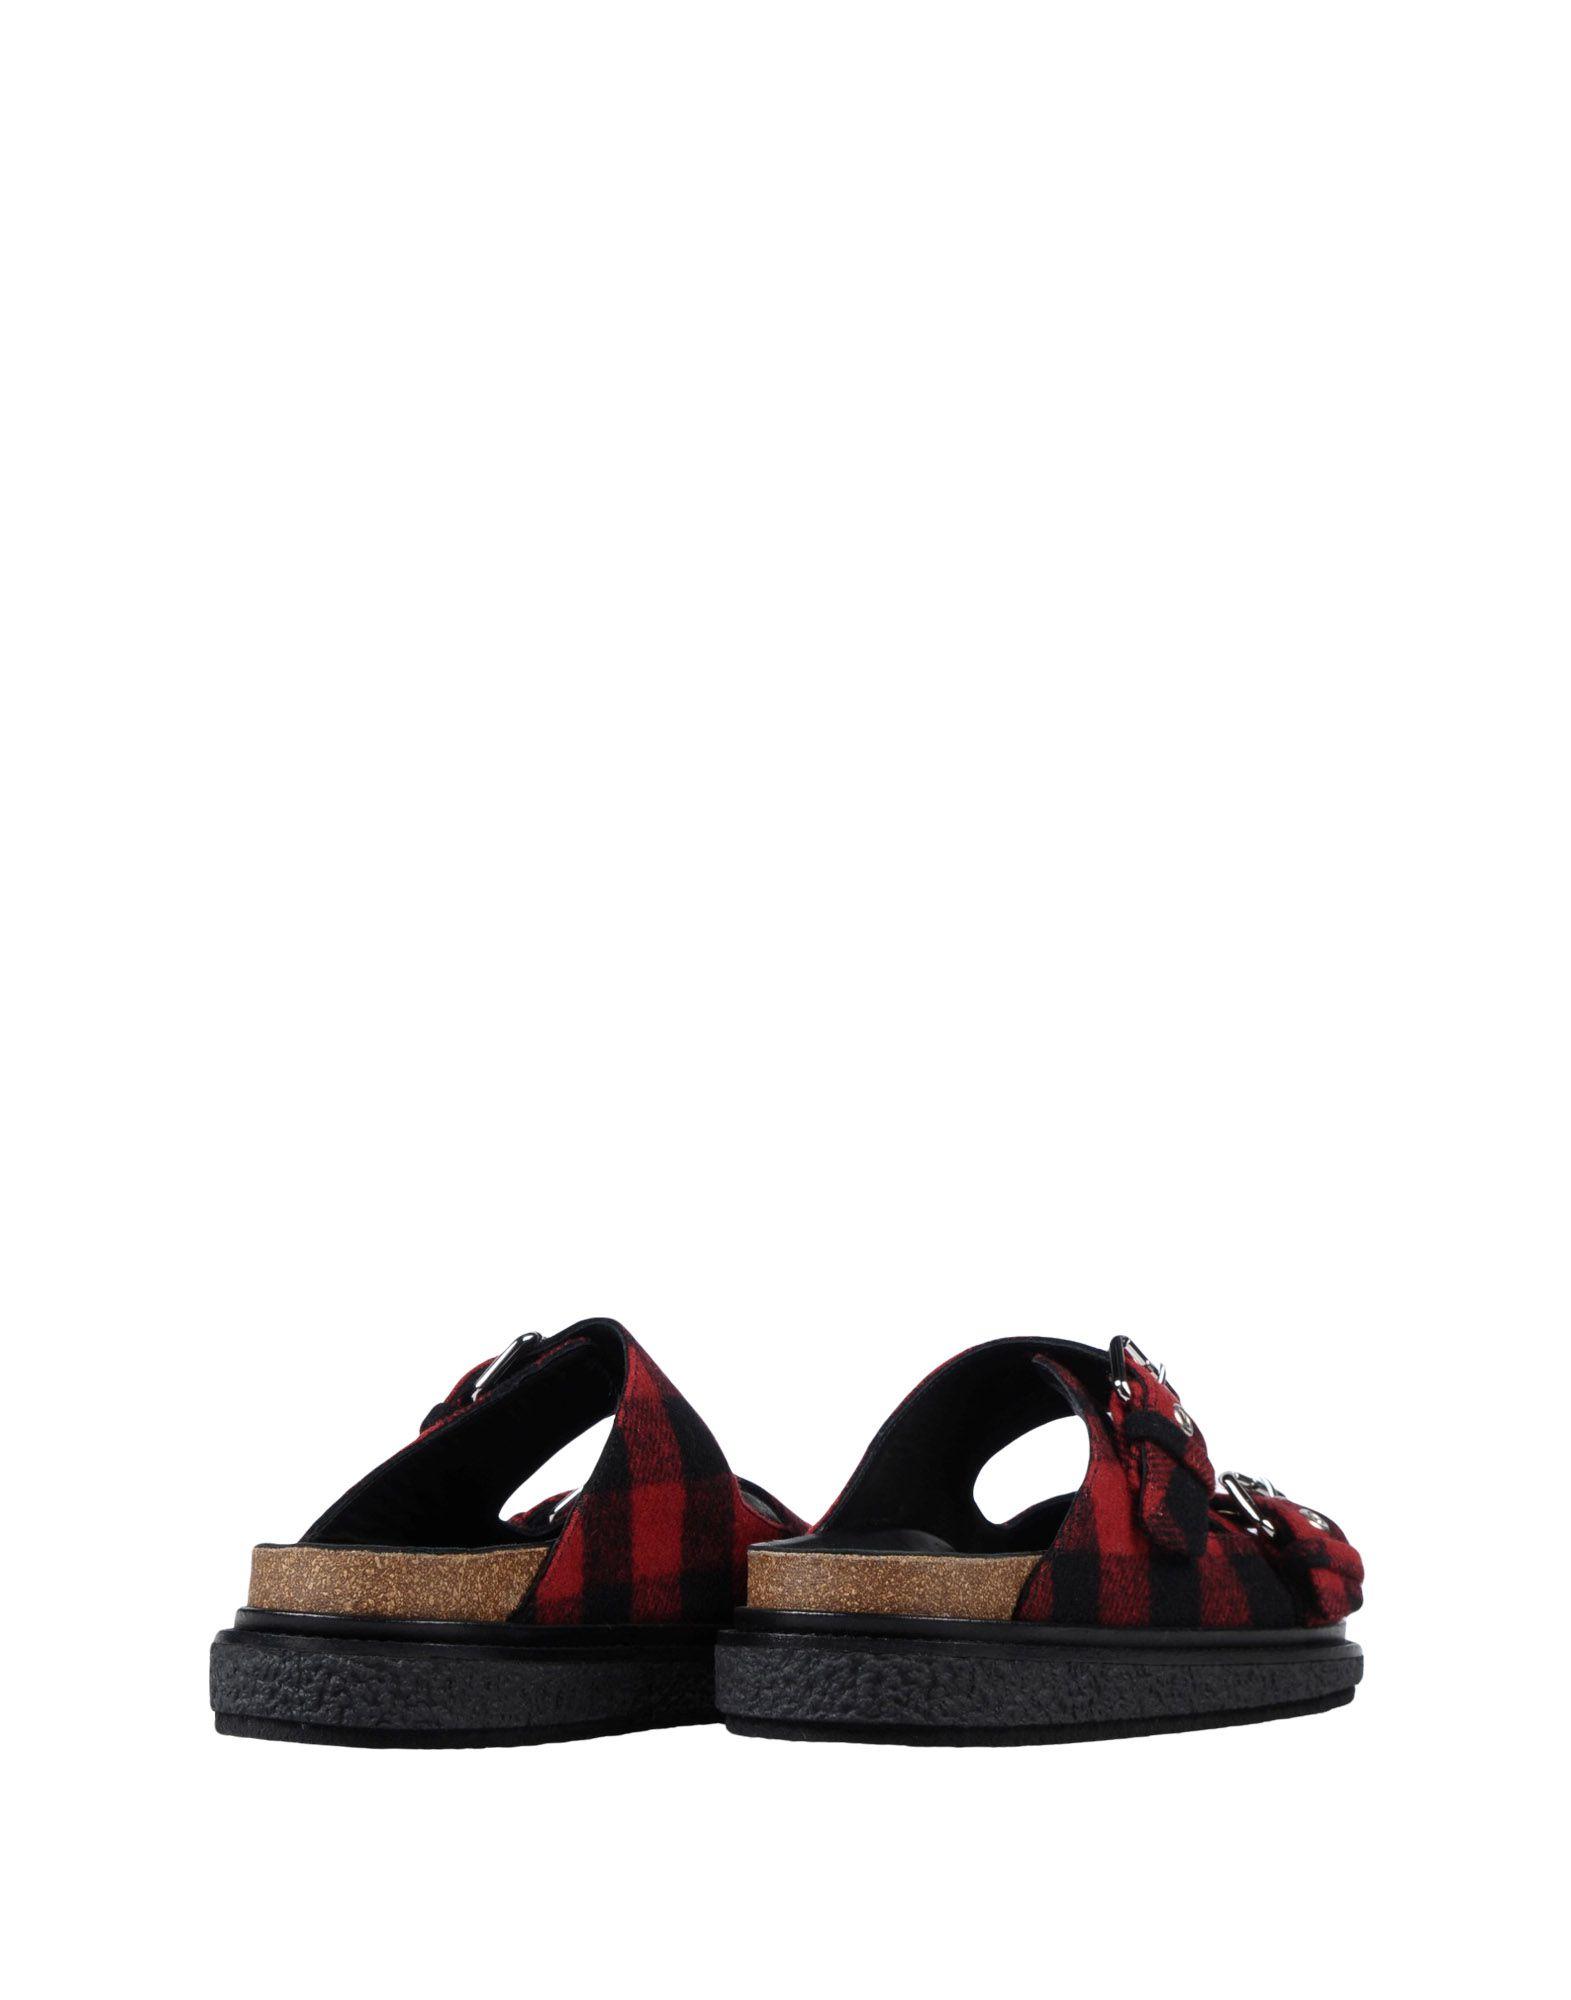 Rabatt Schuhe Isabel 11505216GW Marant Sandalen Damen  11505216GW Isabel e9b6b2